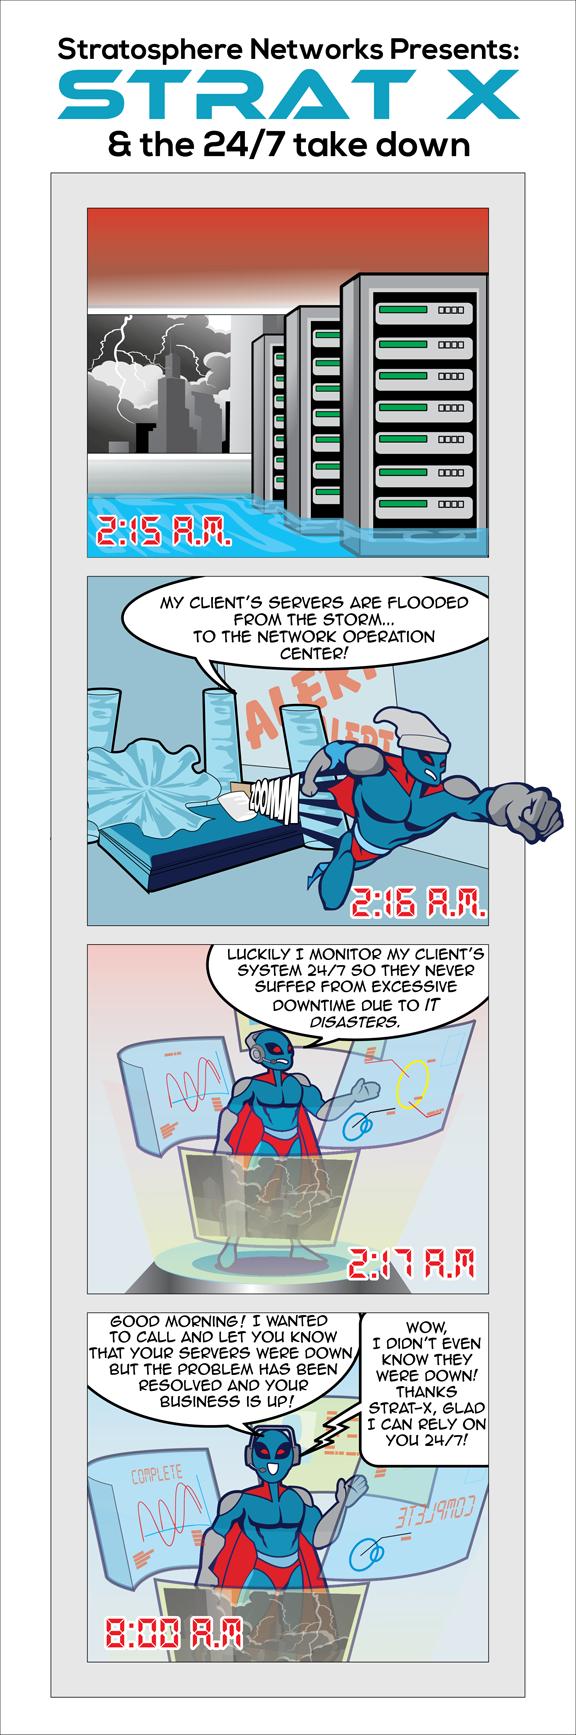 24/7 IT Monitoring Comic